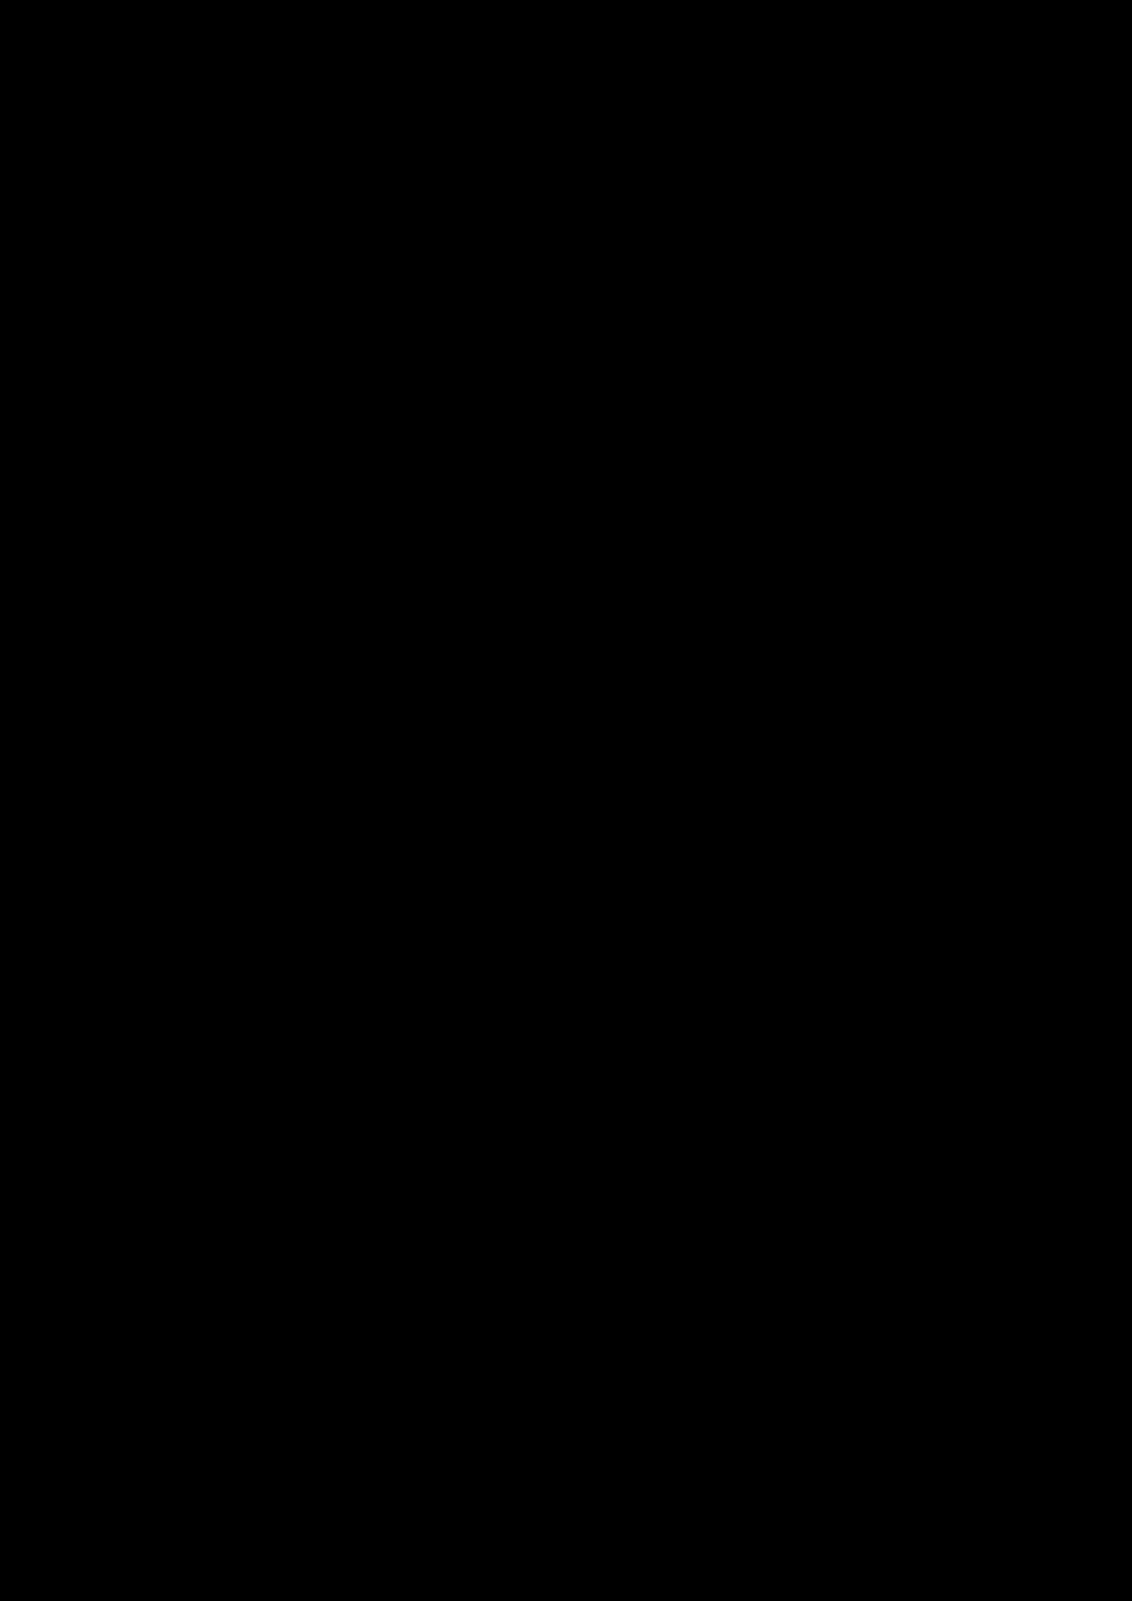 Belyiy sokol slide, Image 35